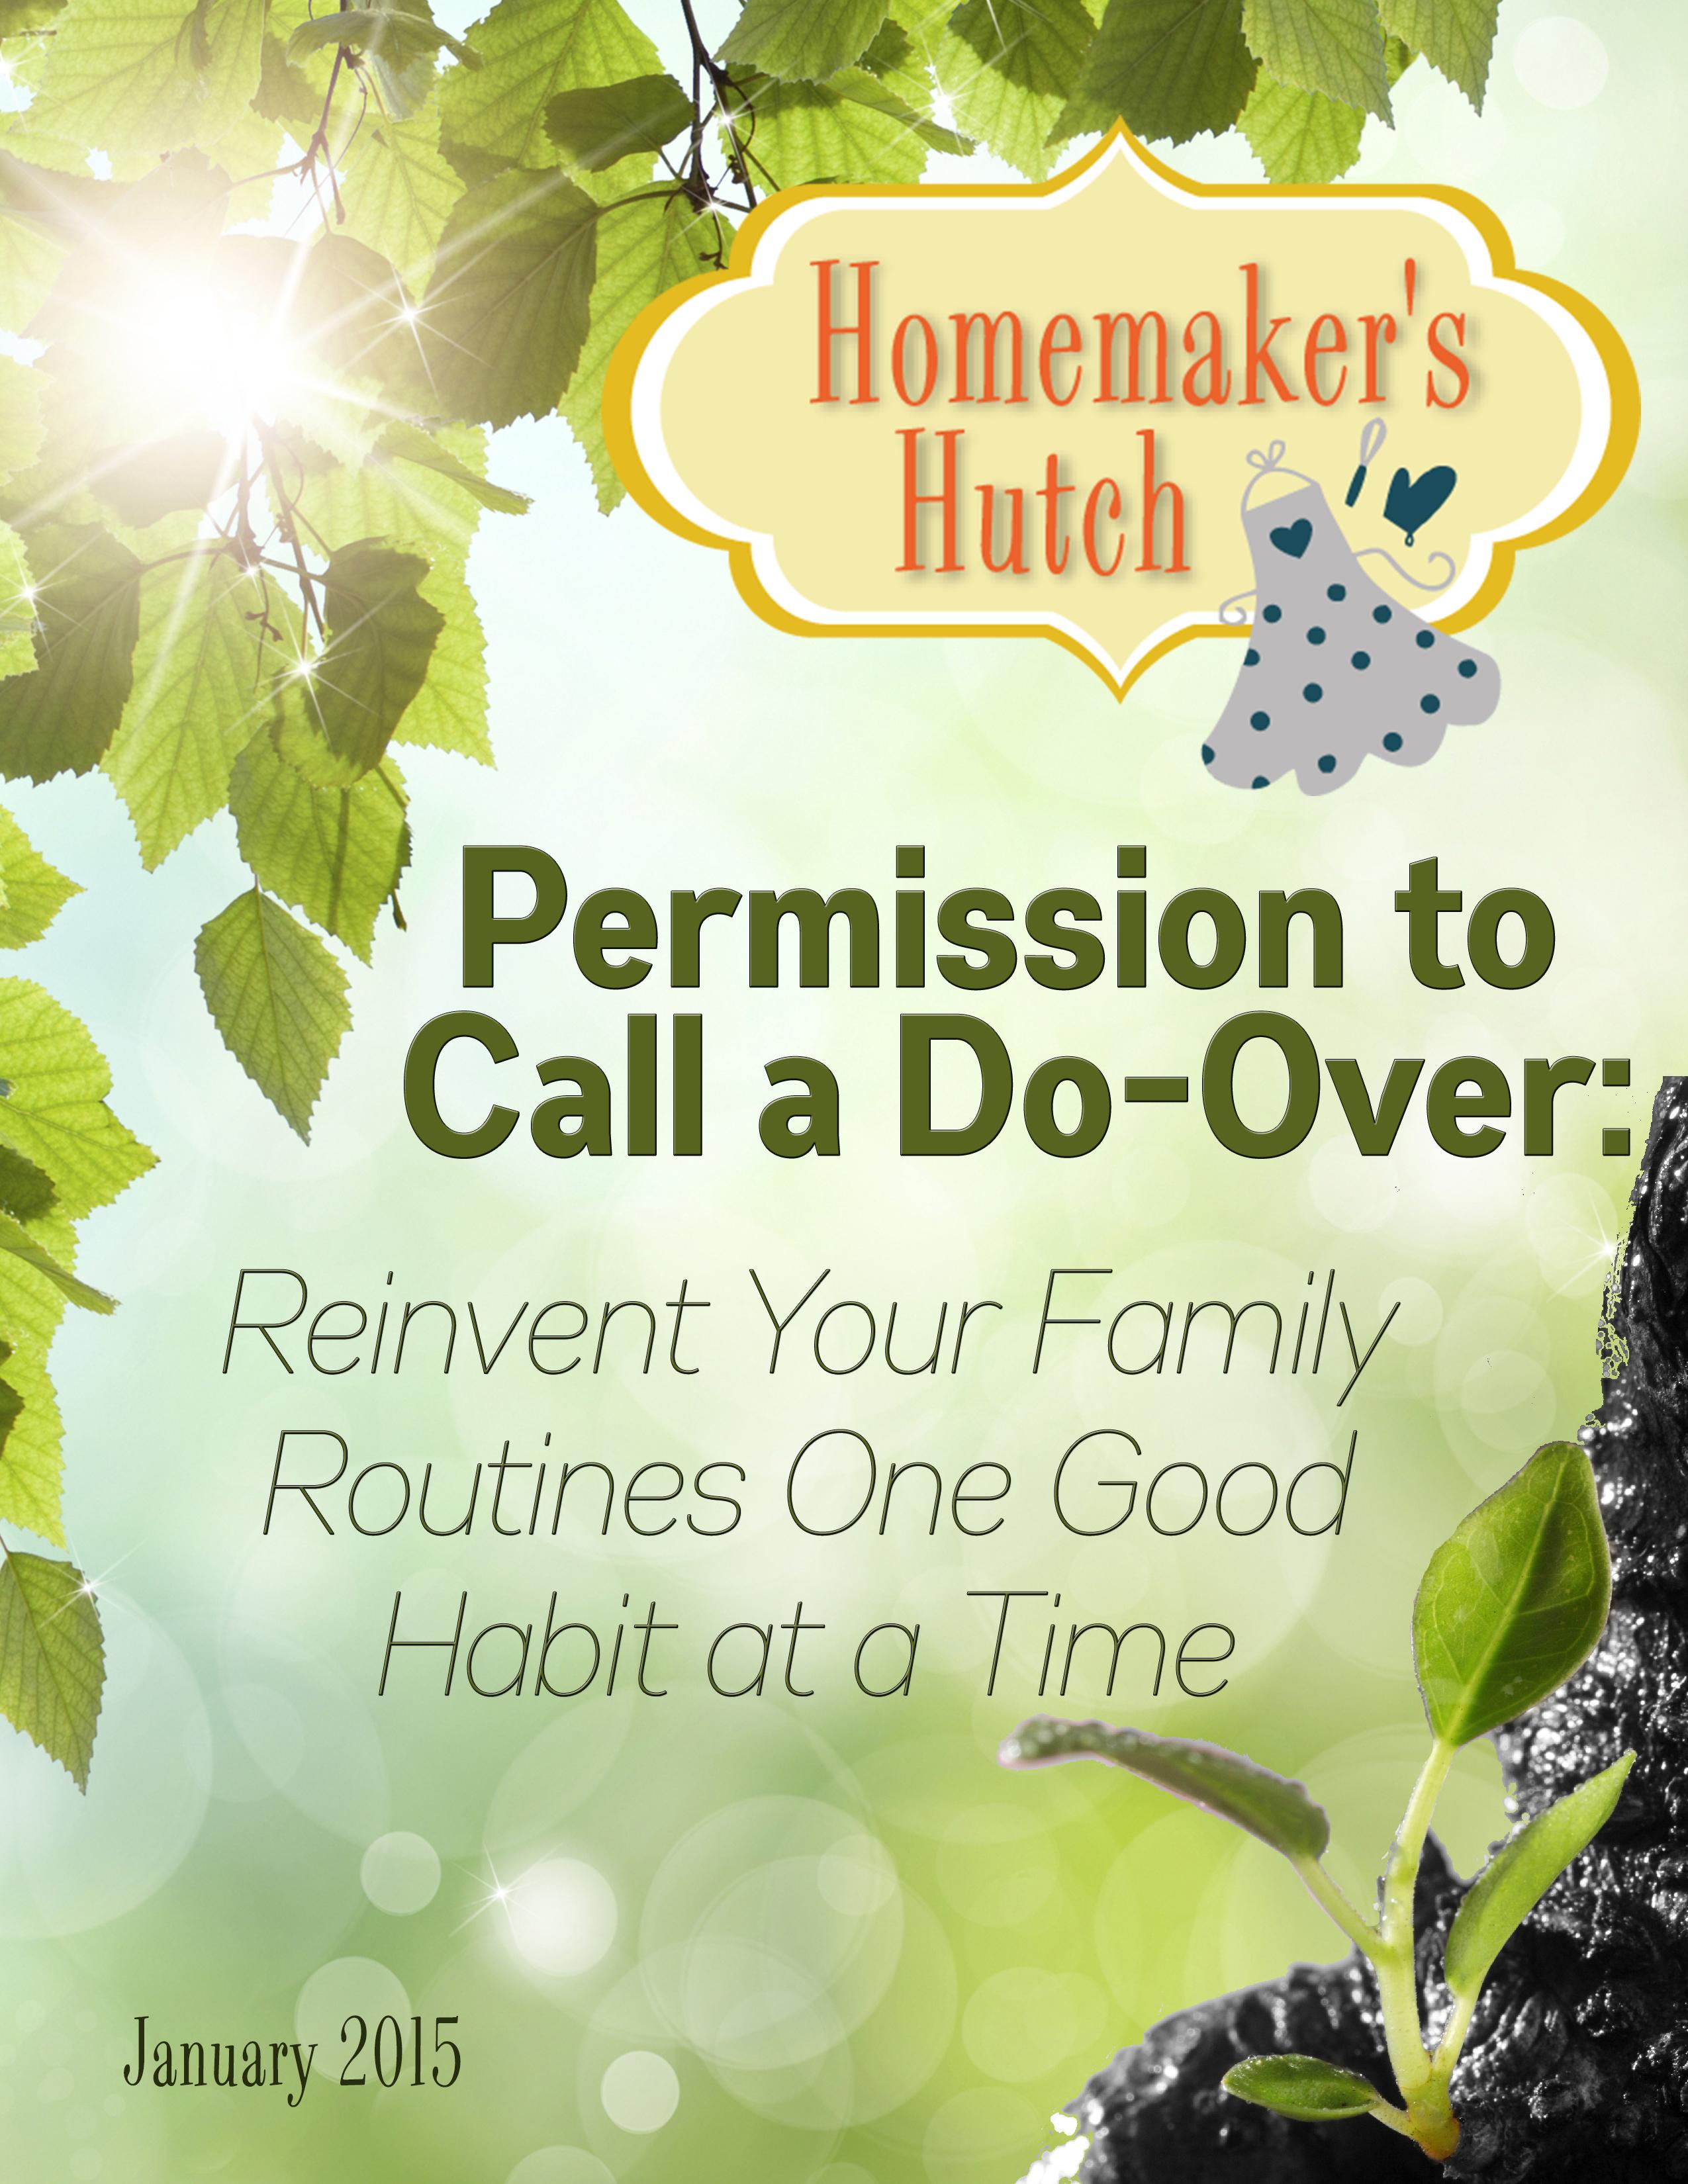 Homemaker's Hutch – Permission to Call a Do-Over